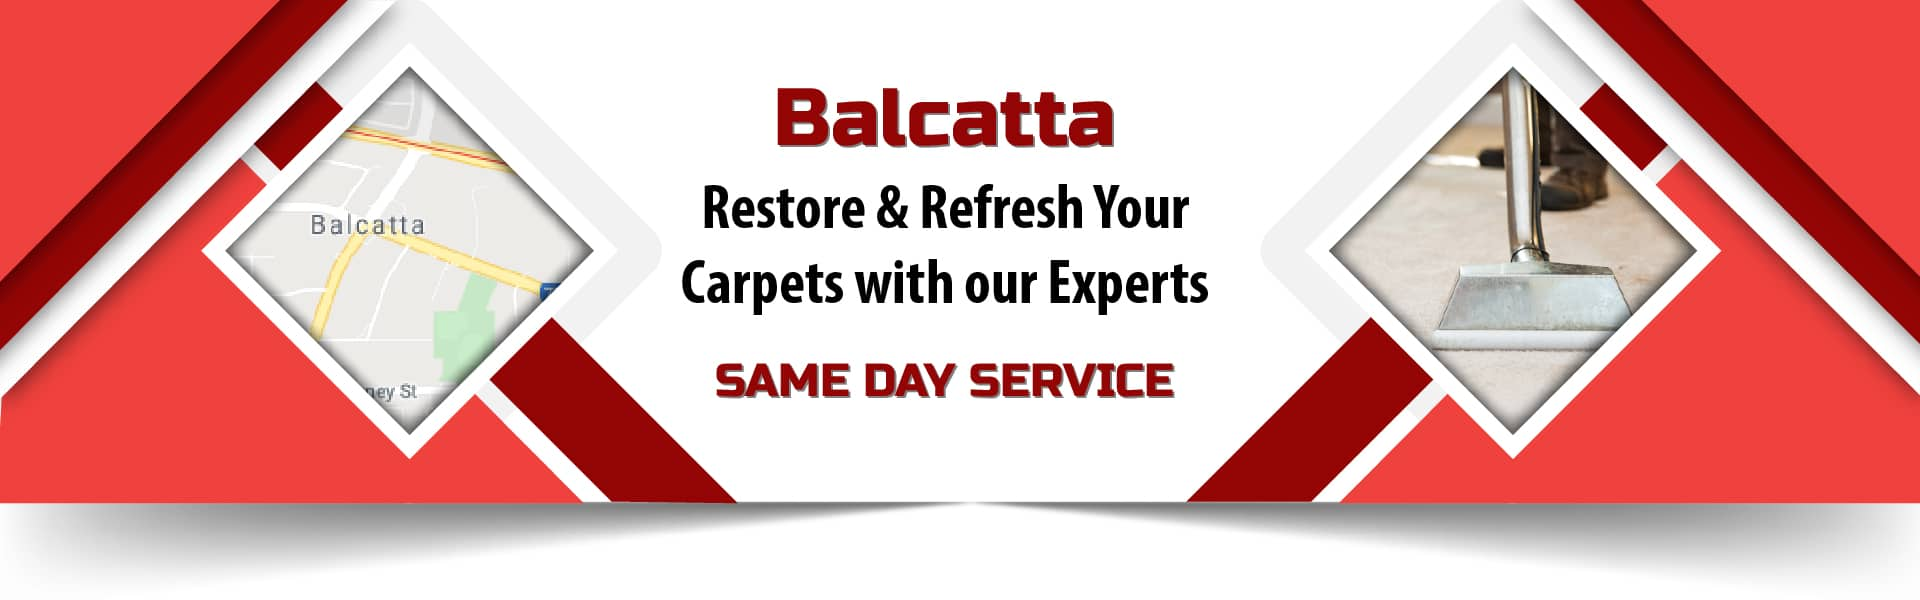 Carpet Cleaning Balcatta